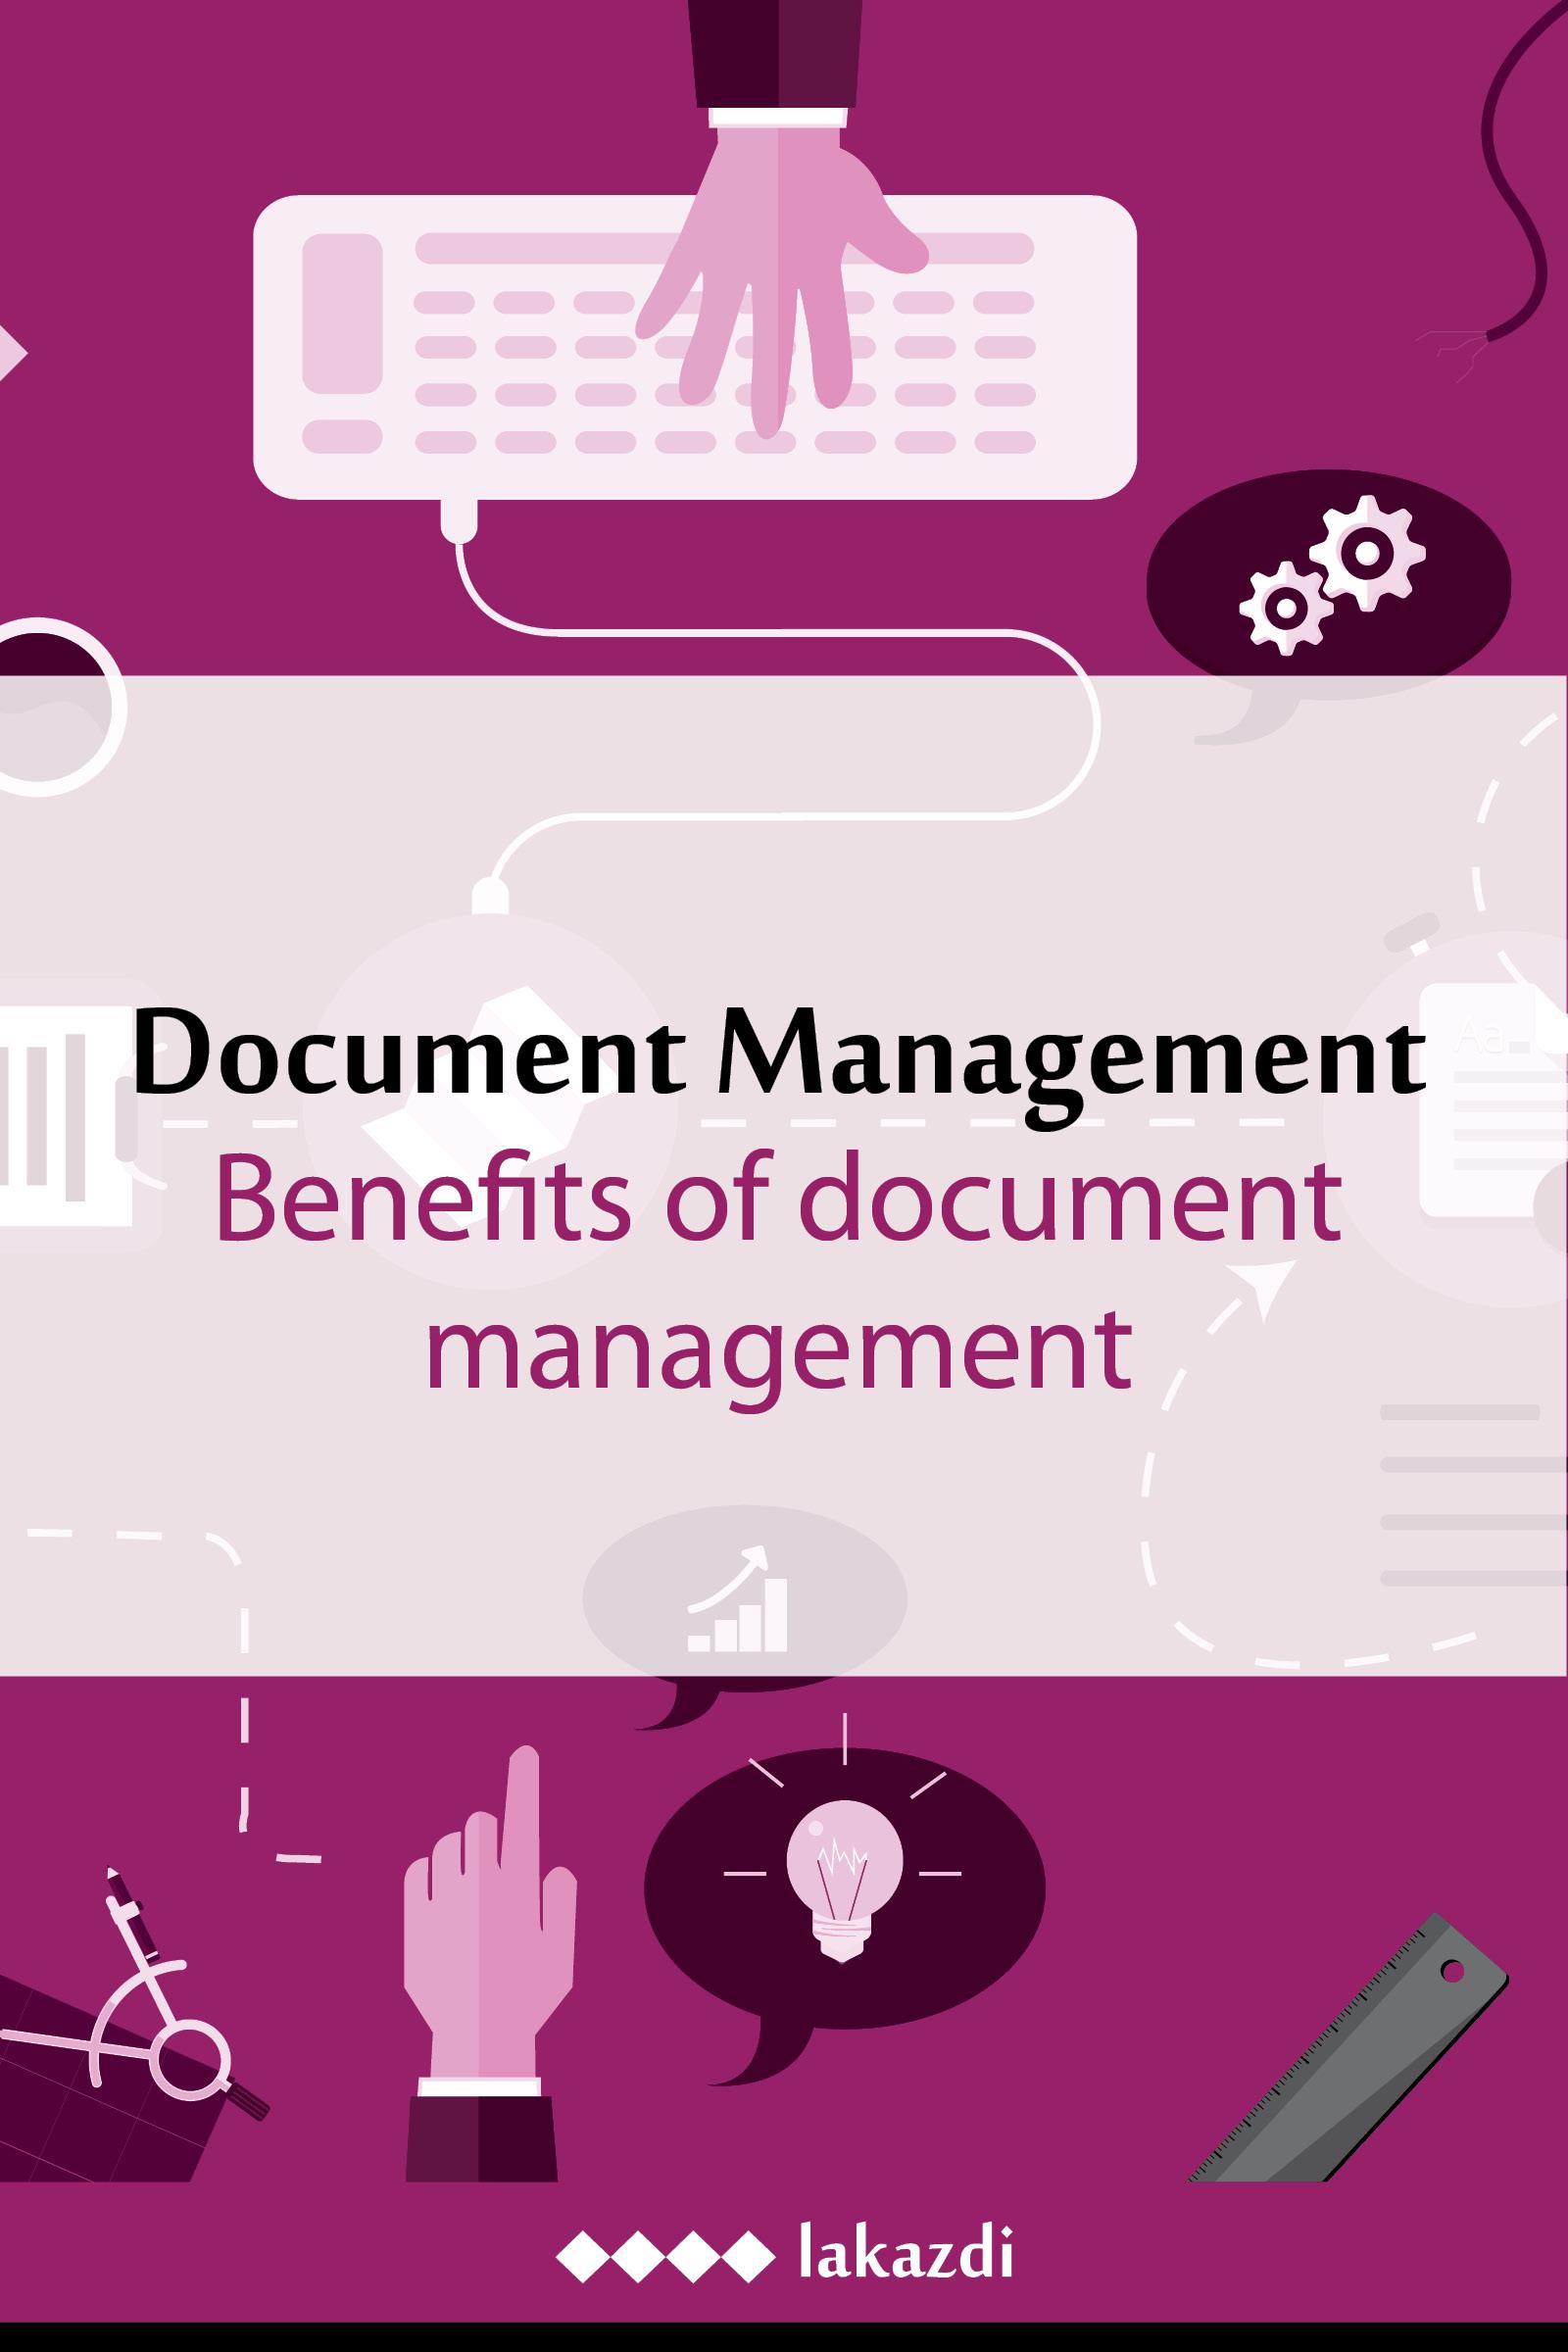 document management tips and benefits workflow and paperless office written by professional graphic document designer lakazdi kassandra marsh from Brisbane Australia